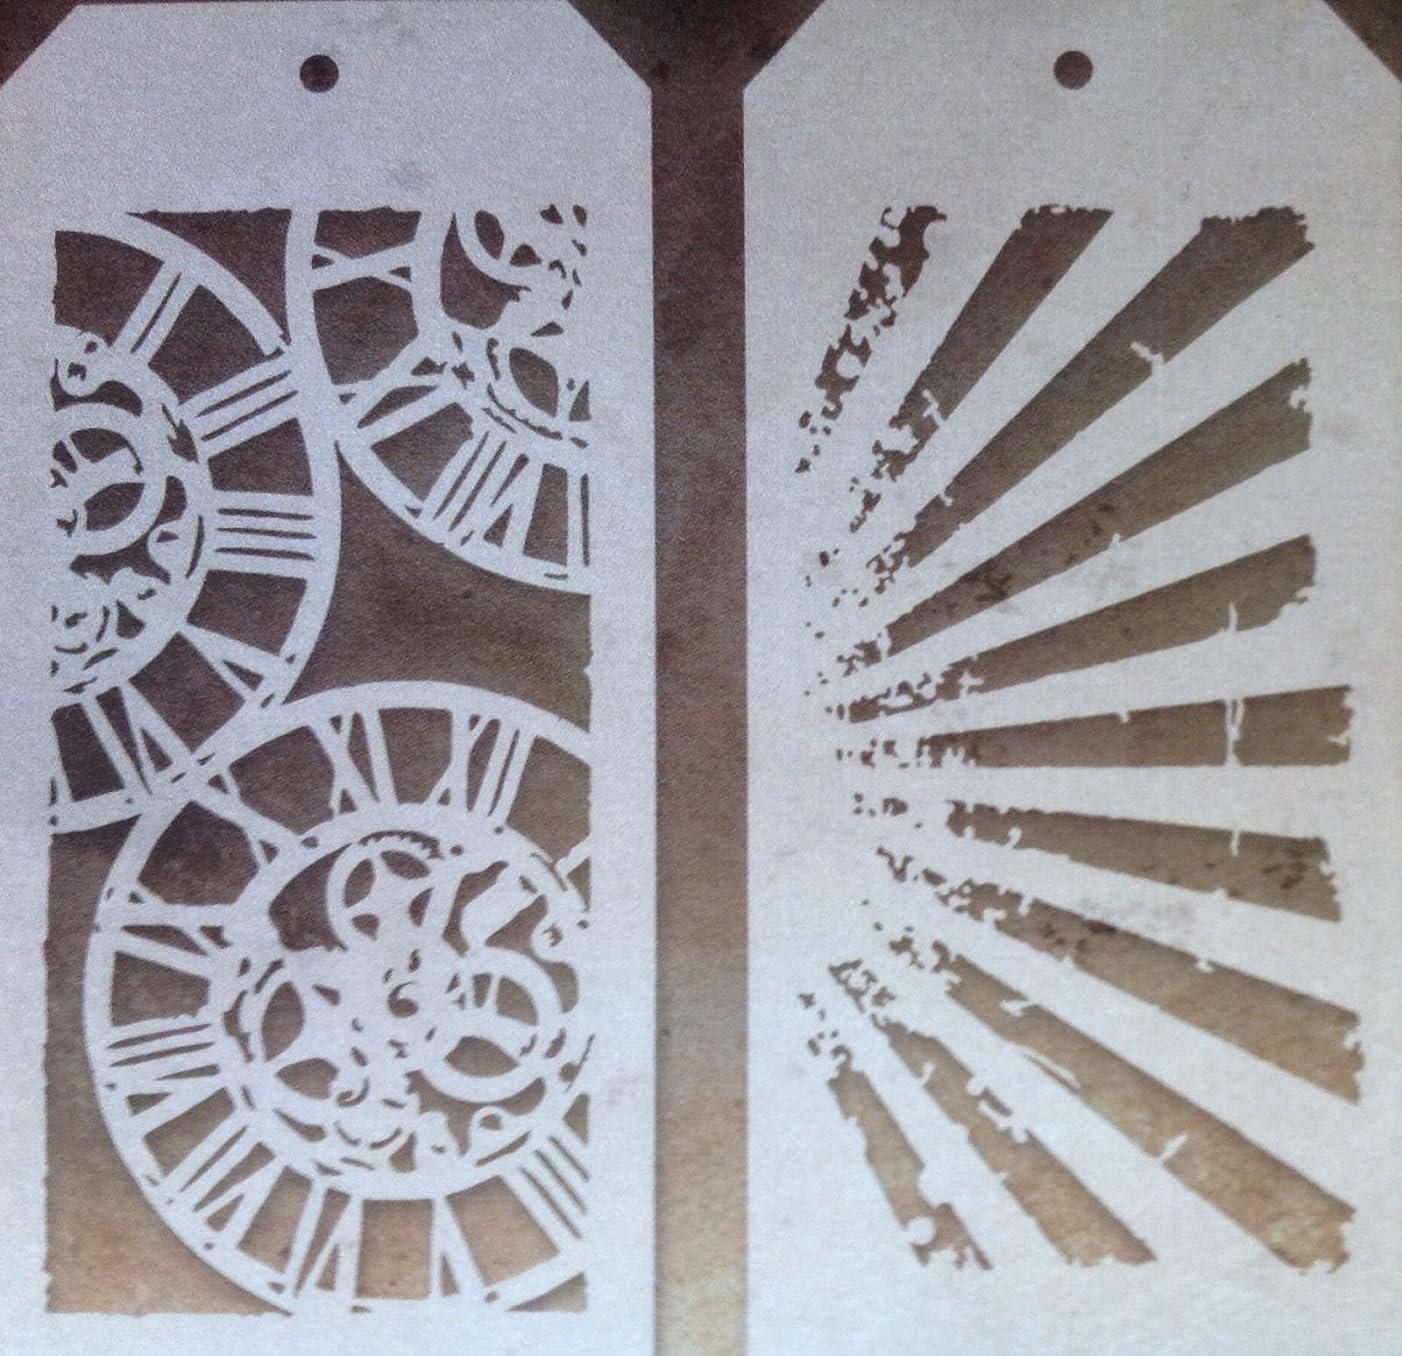 Tim Holtz Layering Stencils Duo Pack ~ Clockwork & Rays!!!